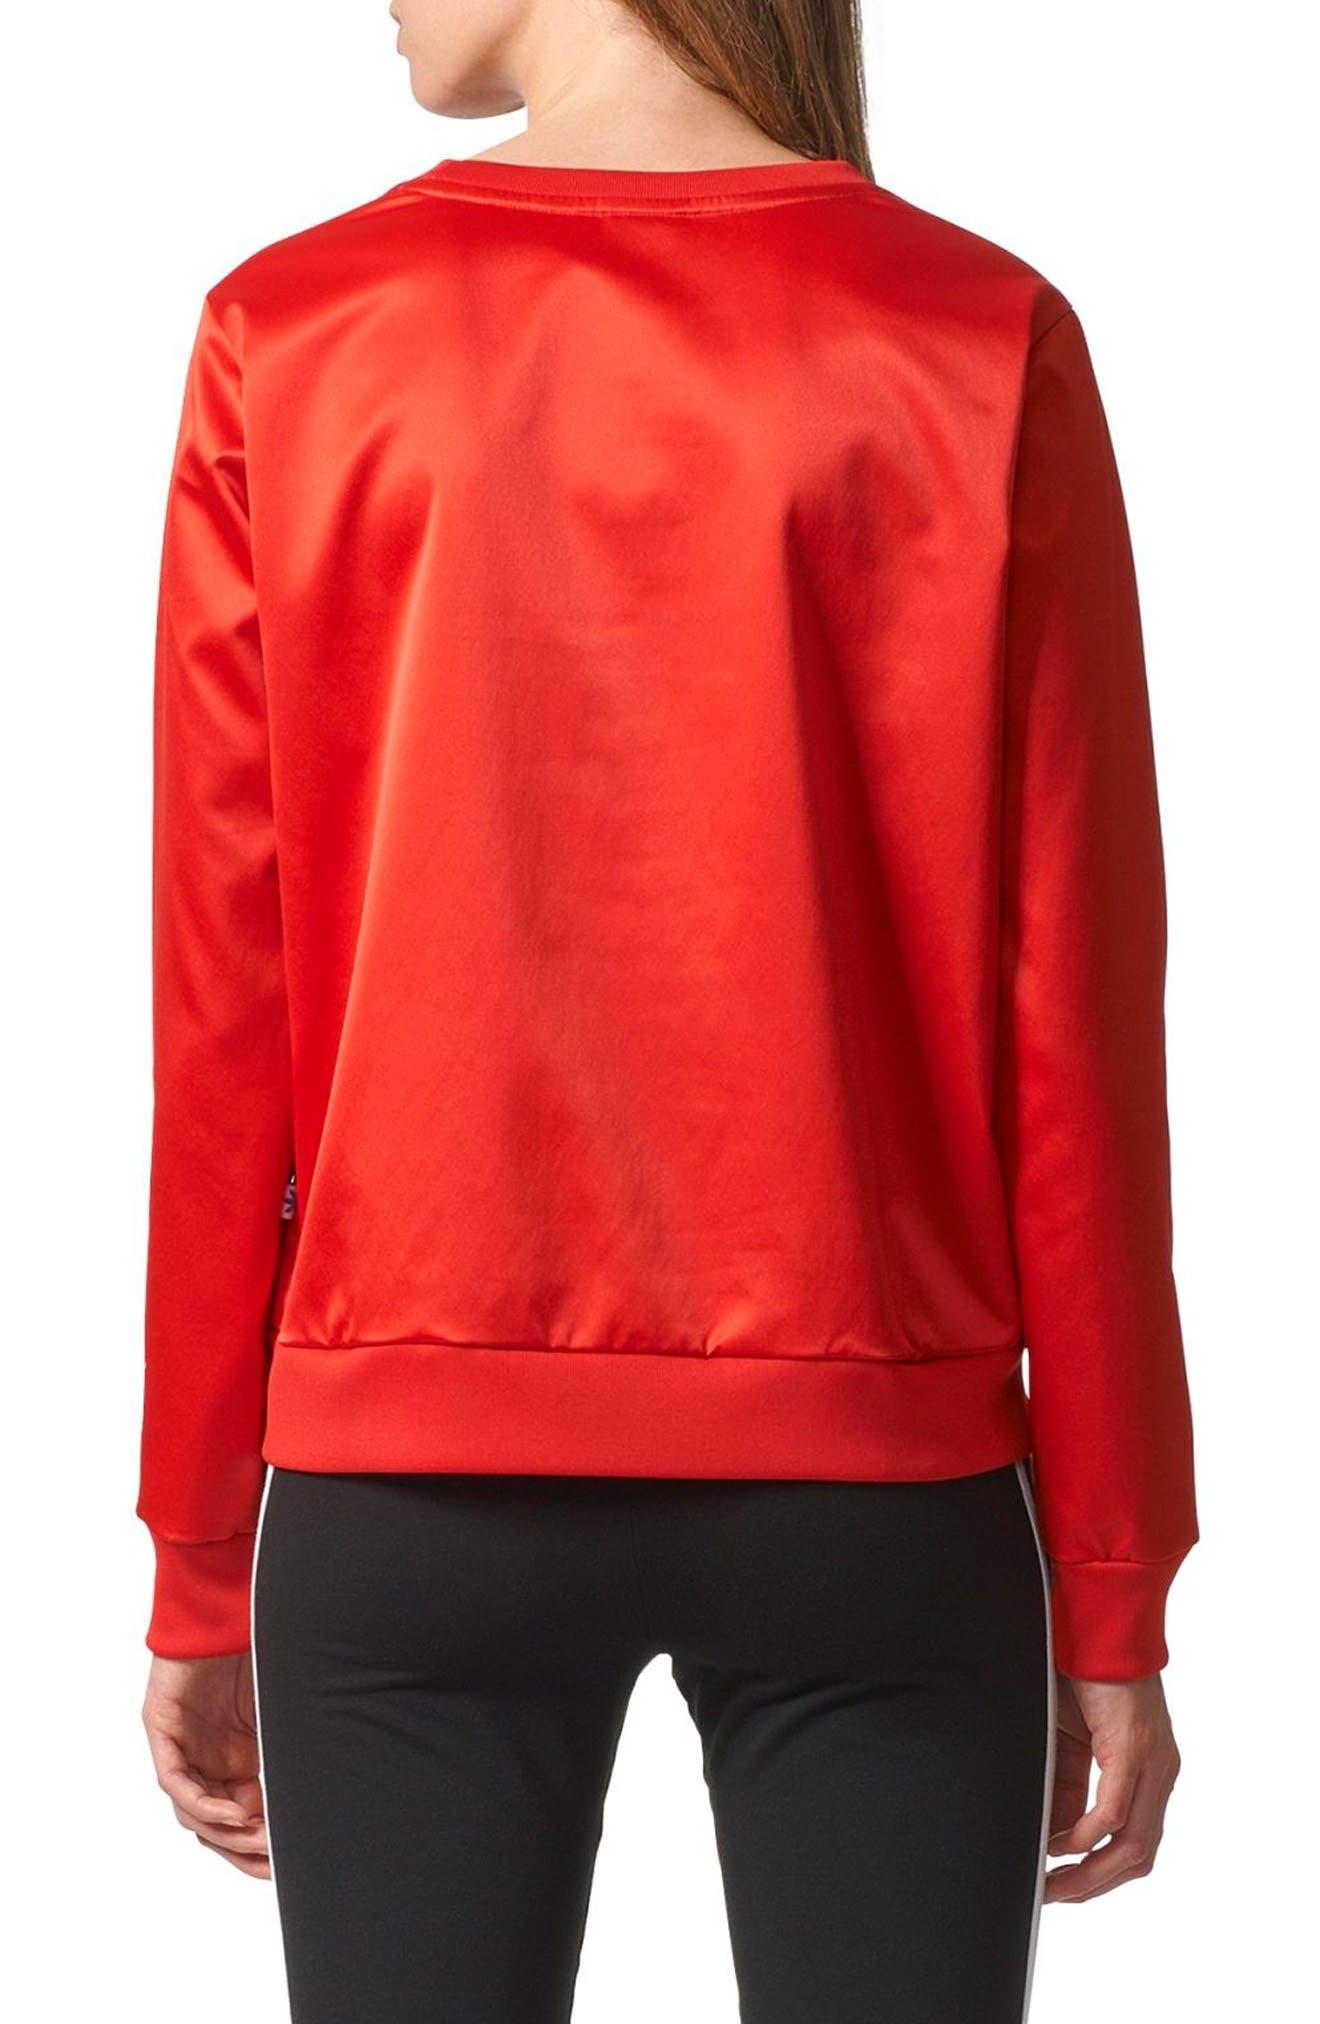 Trefoil Crewneck Sweater,                             Alternate thumbnail 2, color,                             Vivid Red S13